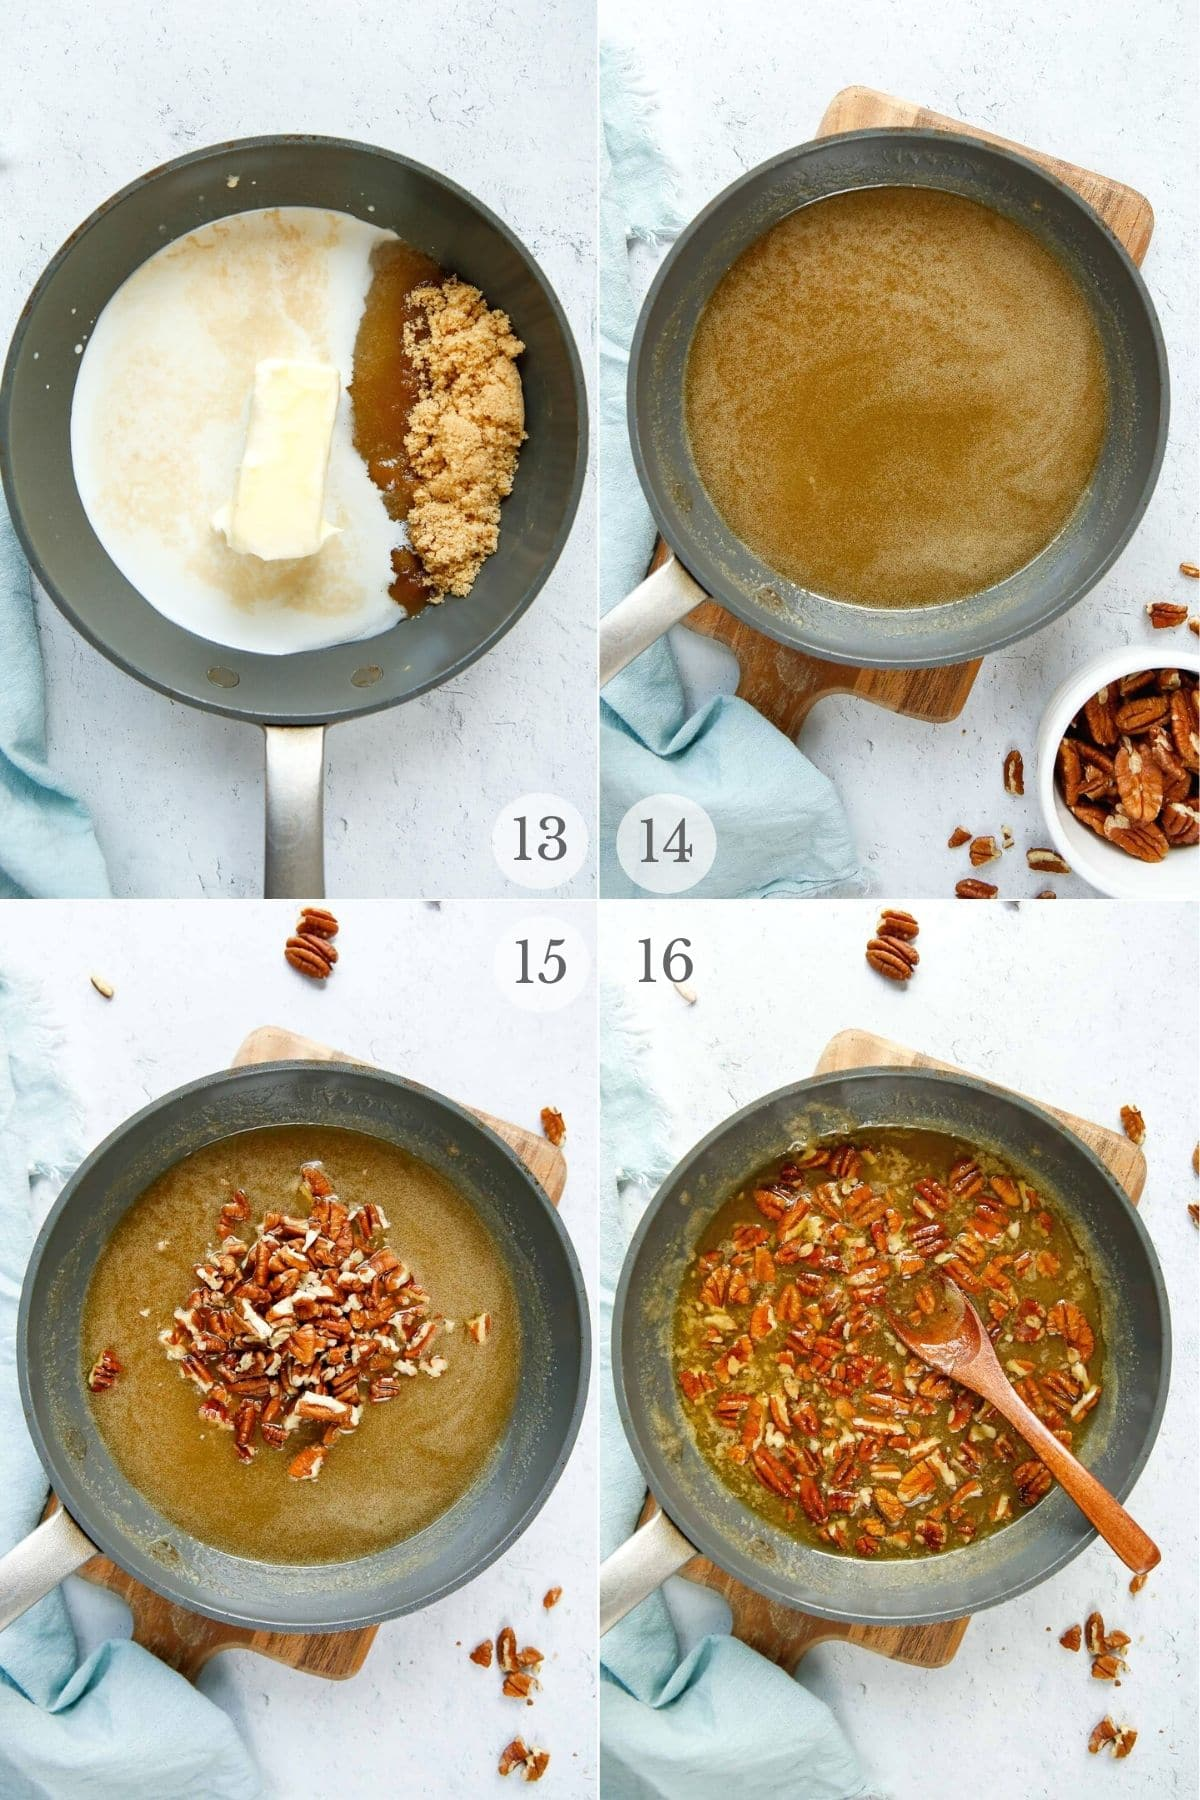 Pumpkin French Toast Casserole (Instant Pot) recipe steps 13-16a